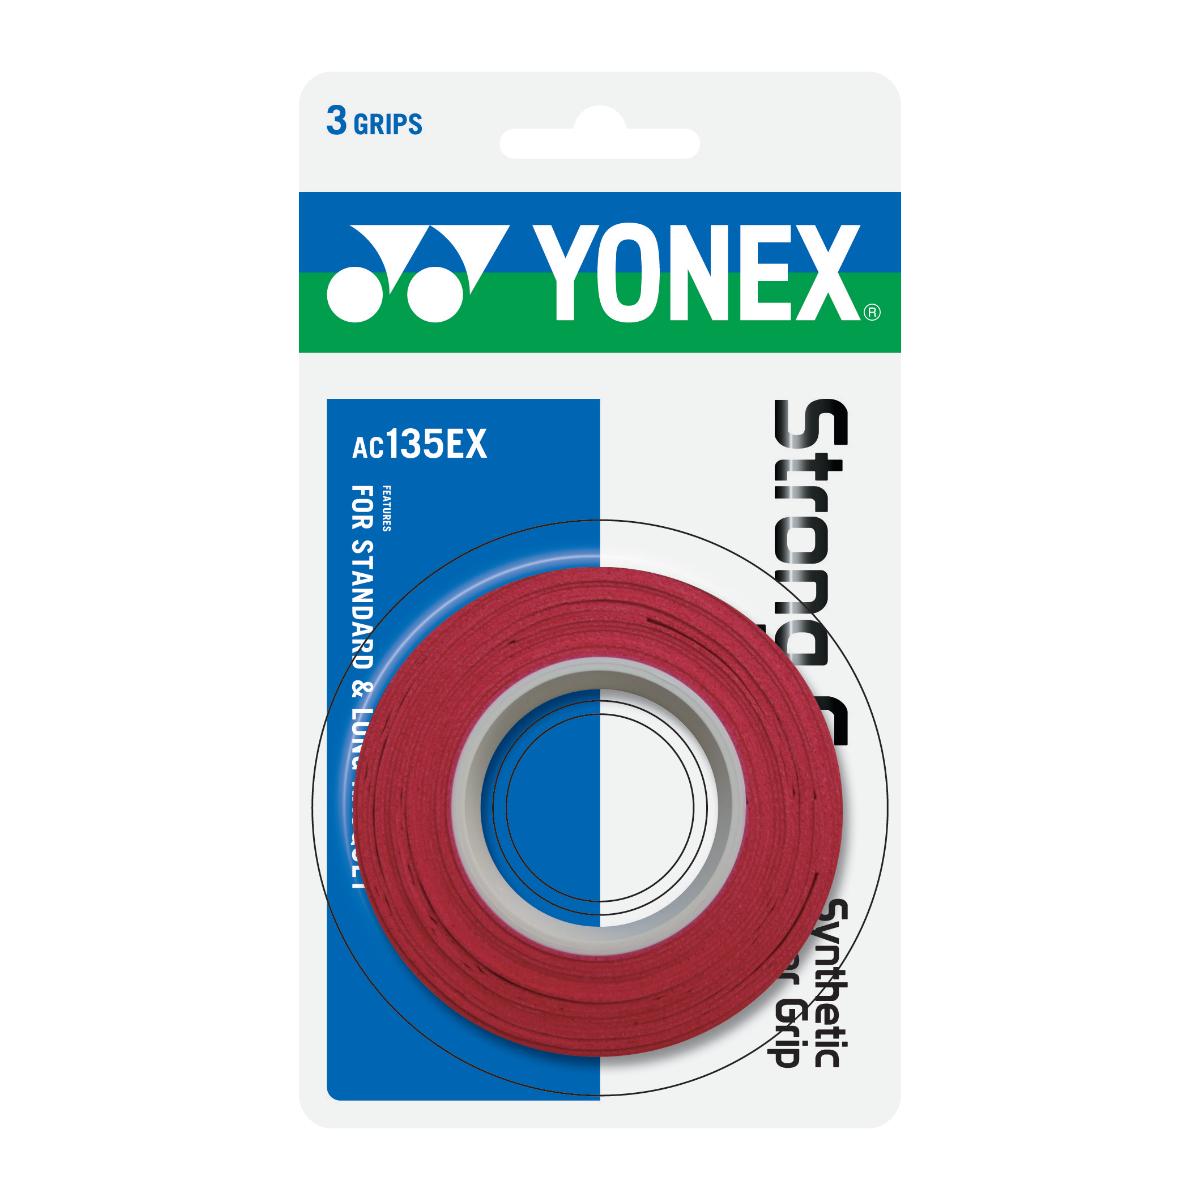 Griffband - YONEX - Strong Grap AC 135Detailbild - 1